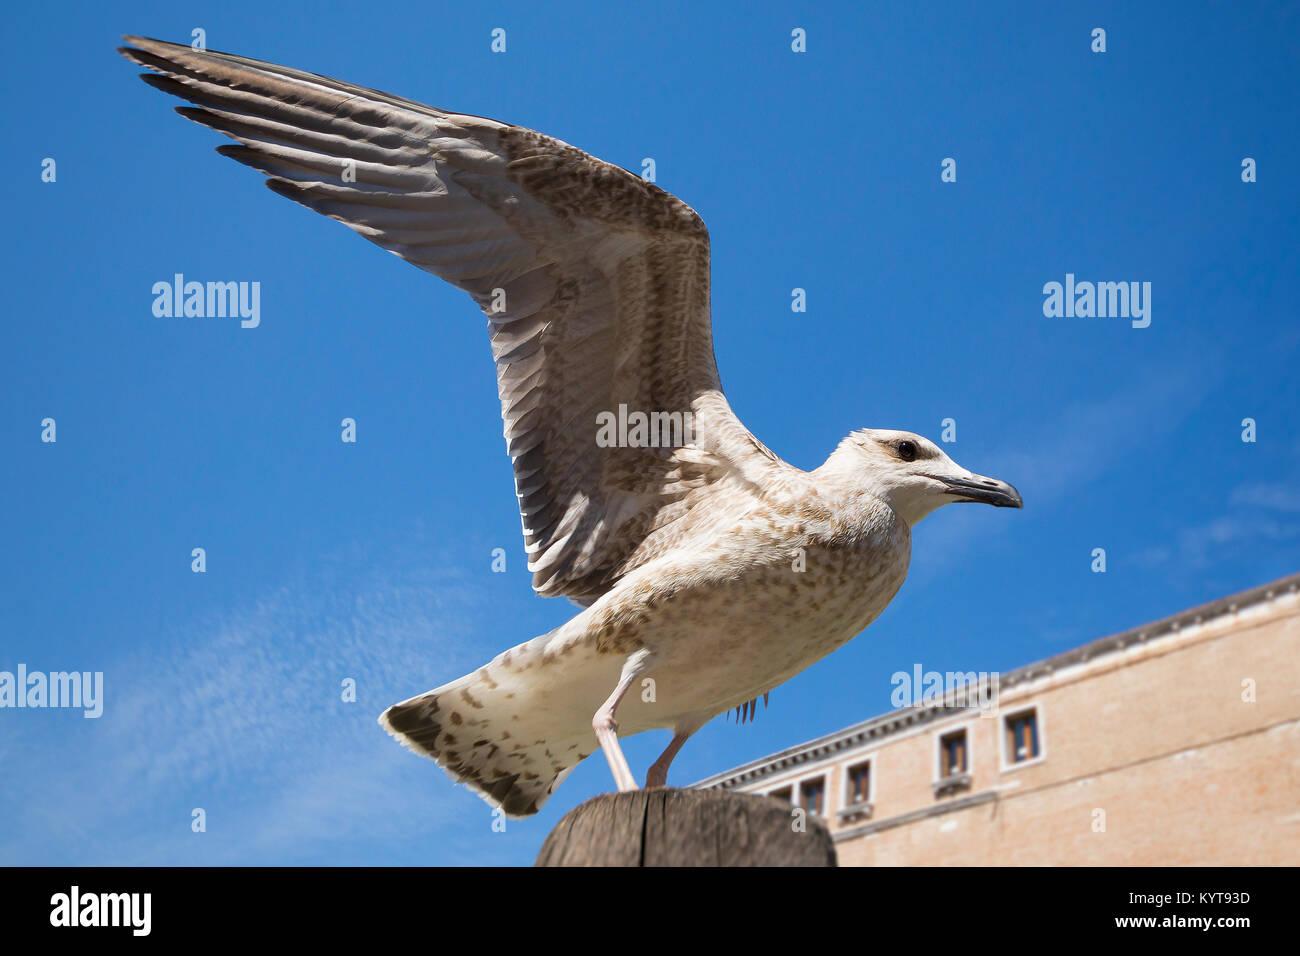 Seagull in  Venice - Stock Image